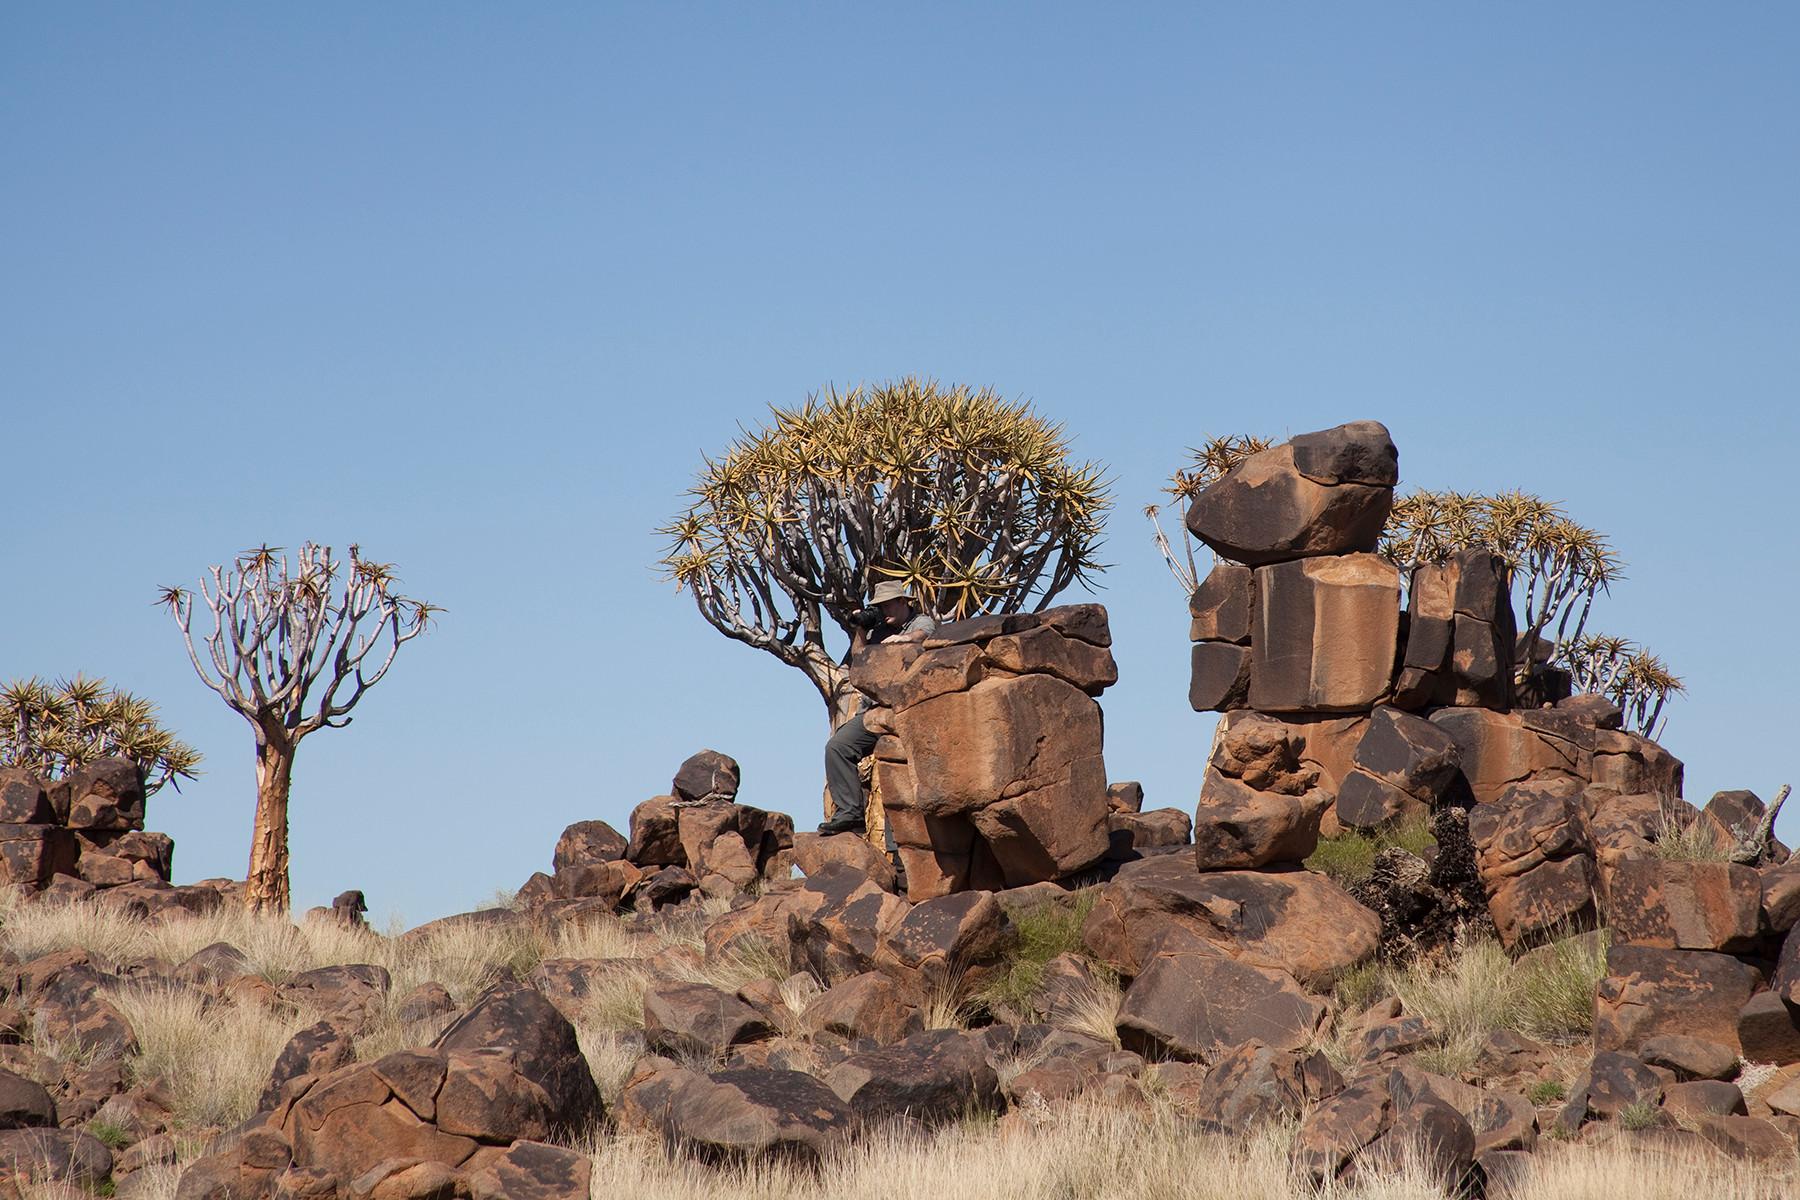 Namibia 2012 (Mesosaurus)